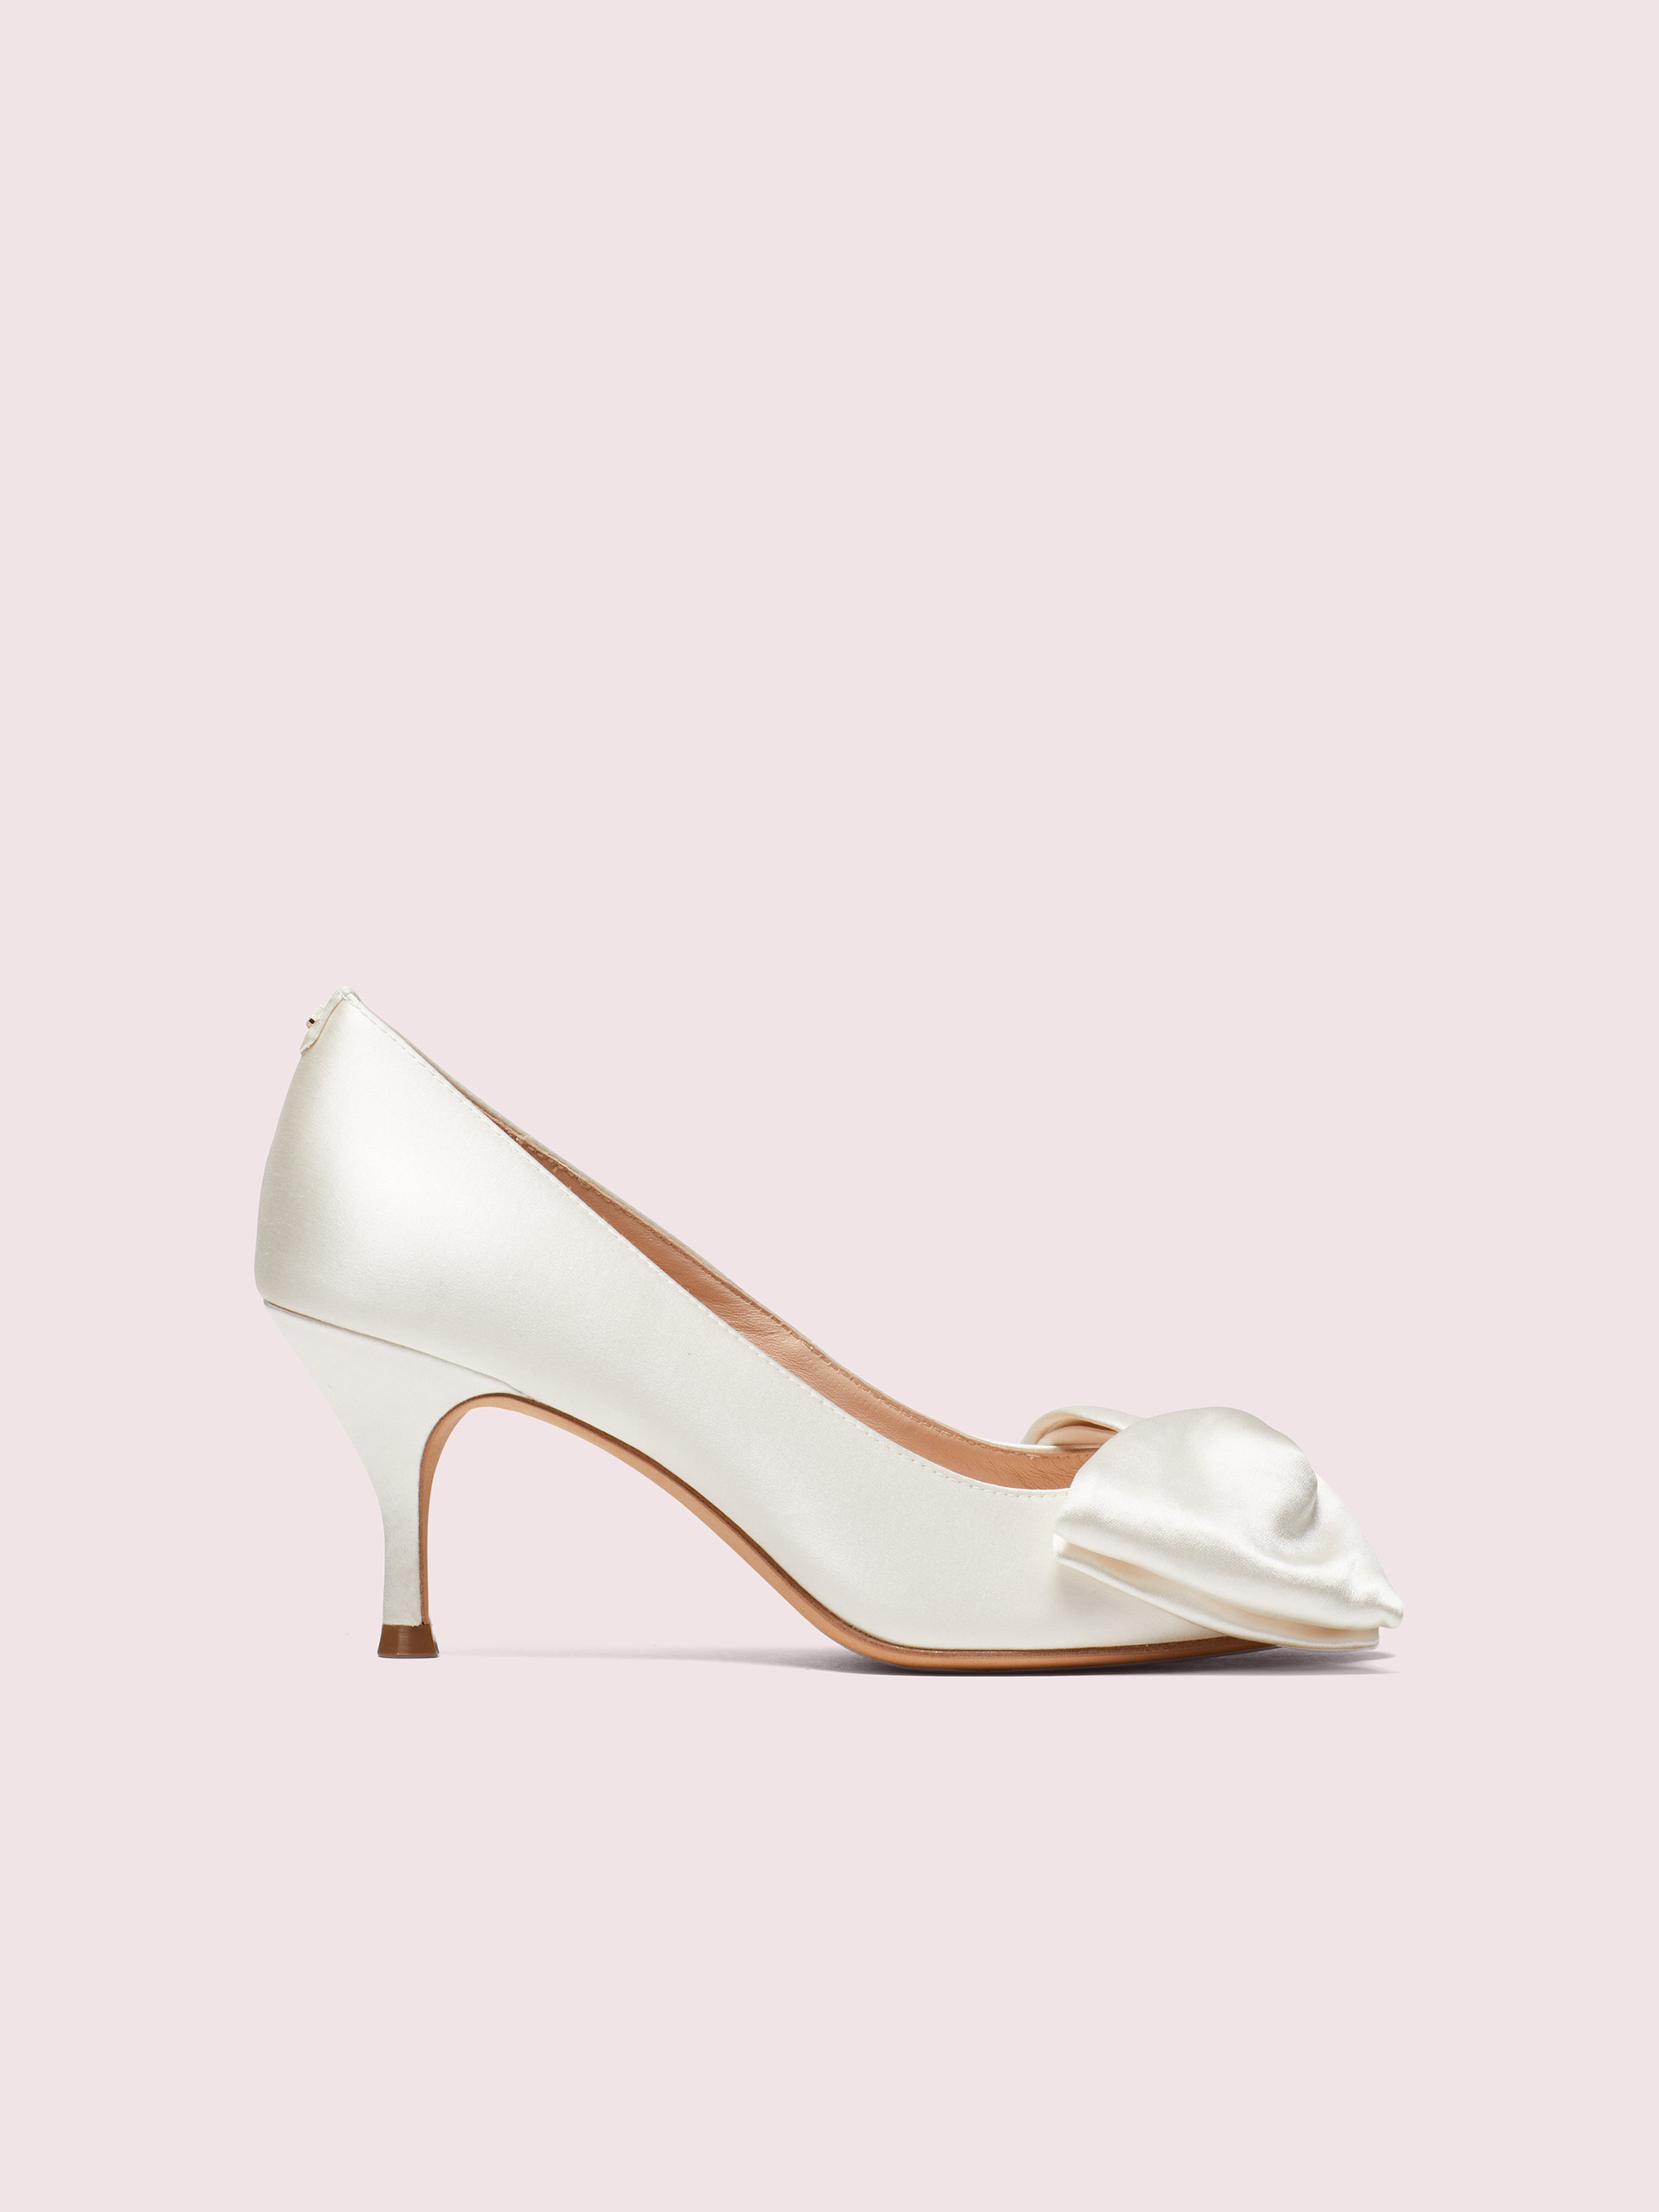 Kate spade crawford peep-toe pumps